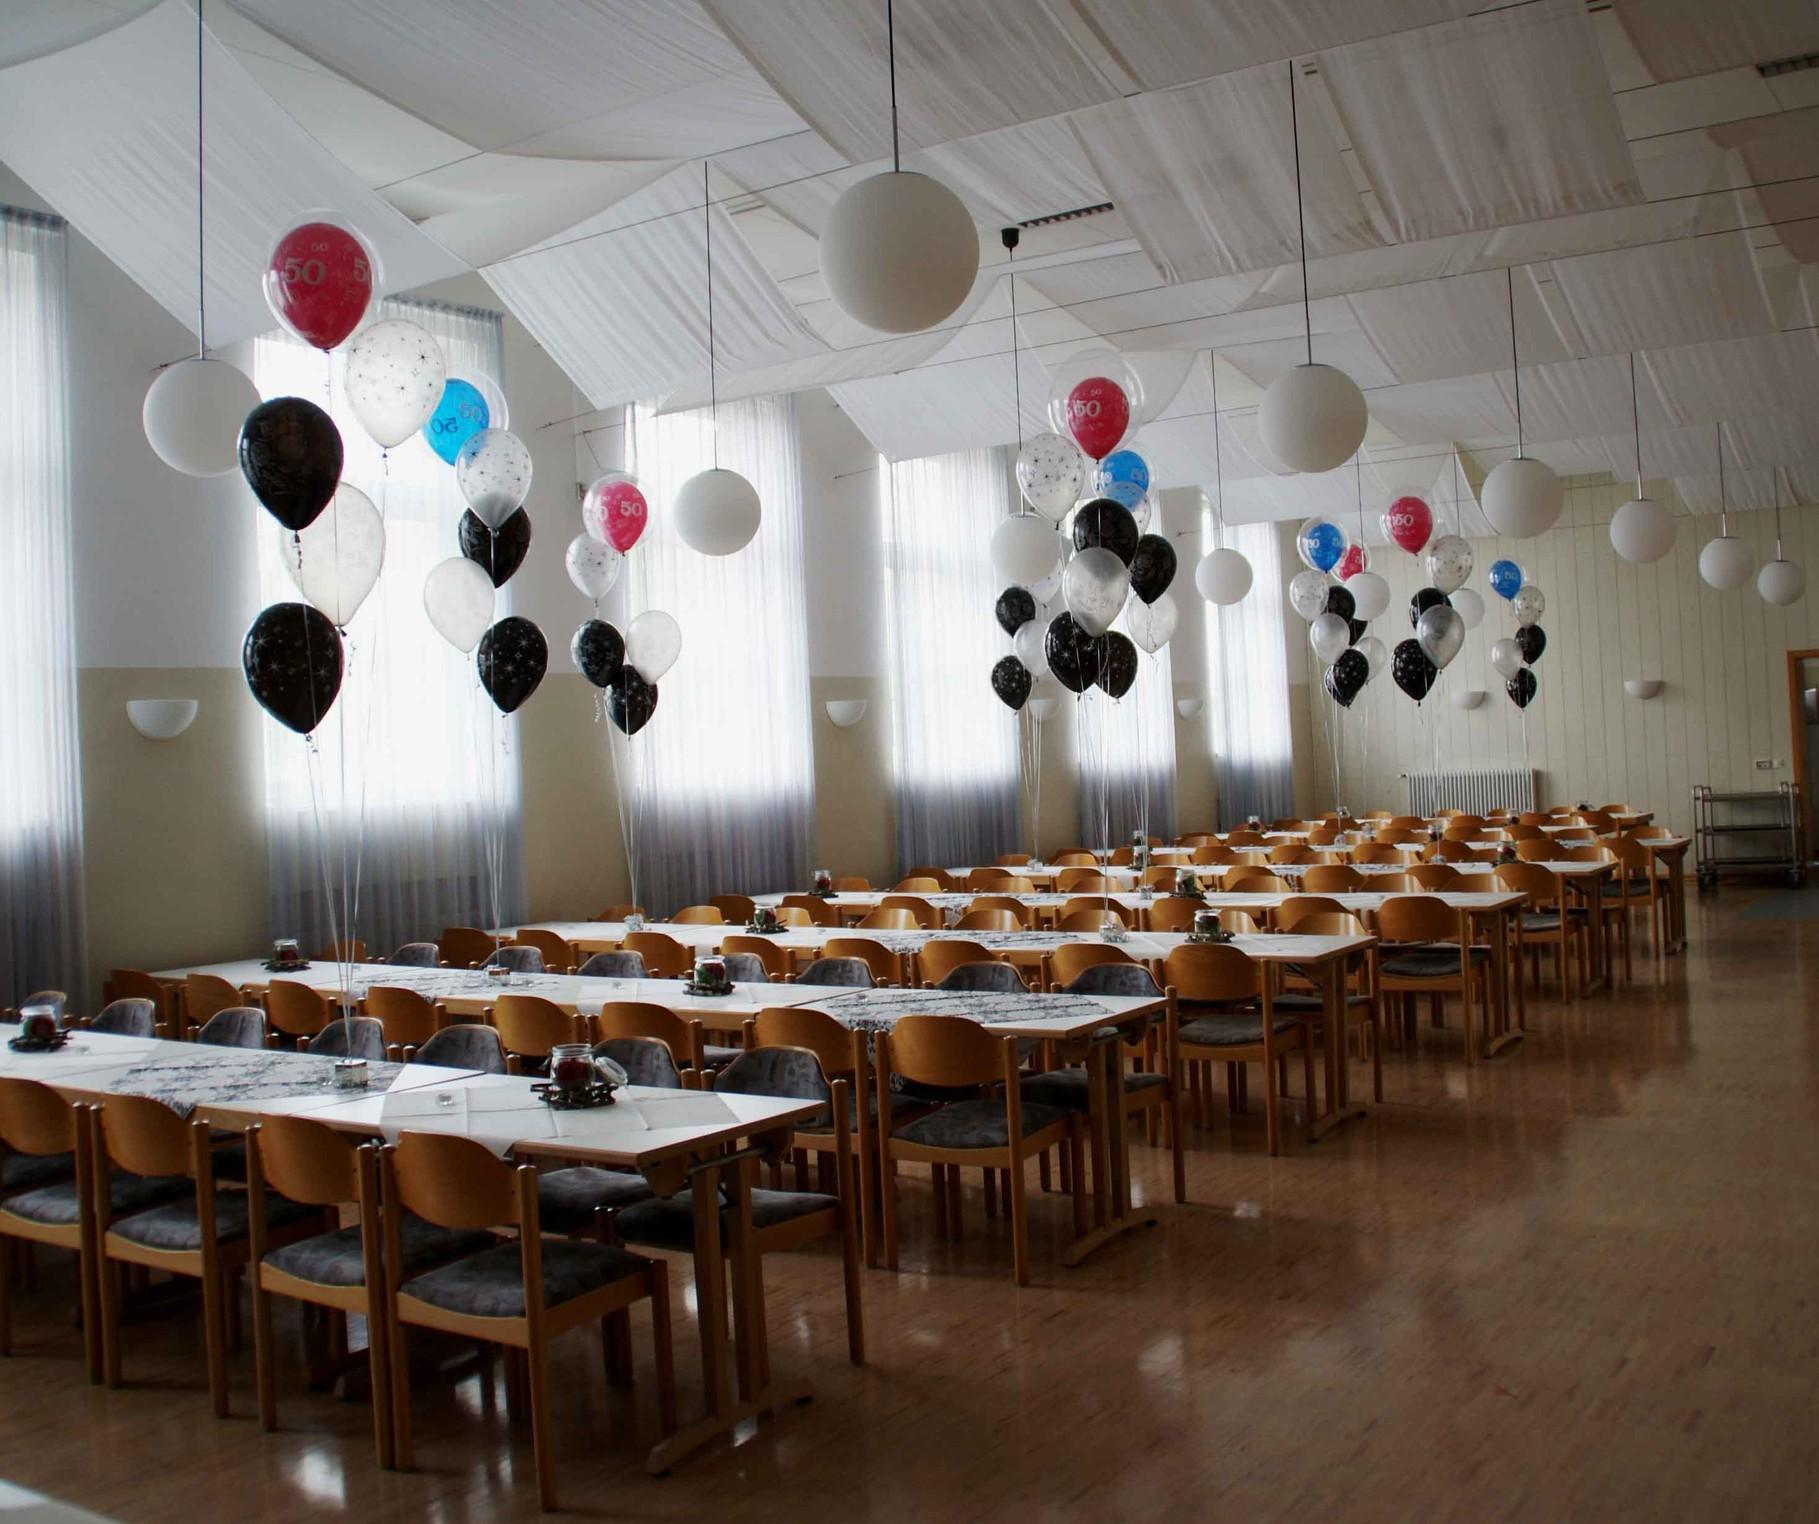 Tischdekoration aus Ballonen - Mr. Balloni\'s Ballonkunst!